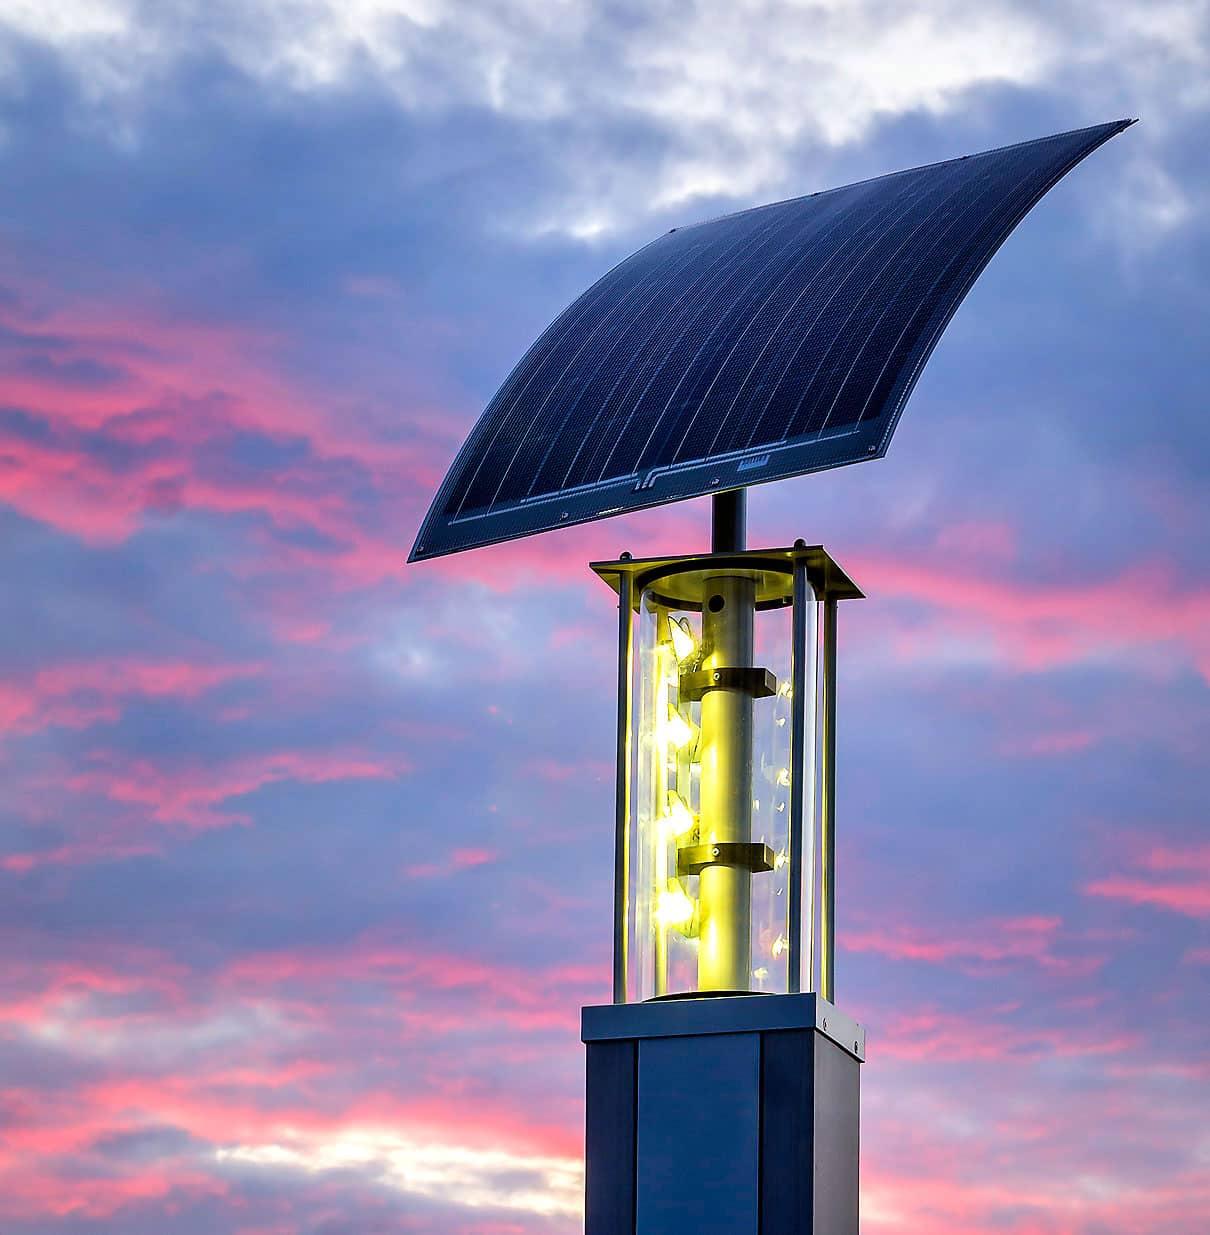 Flexible solar panels for ecoLights solar street pole